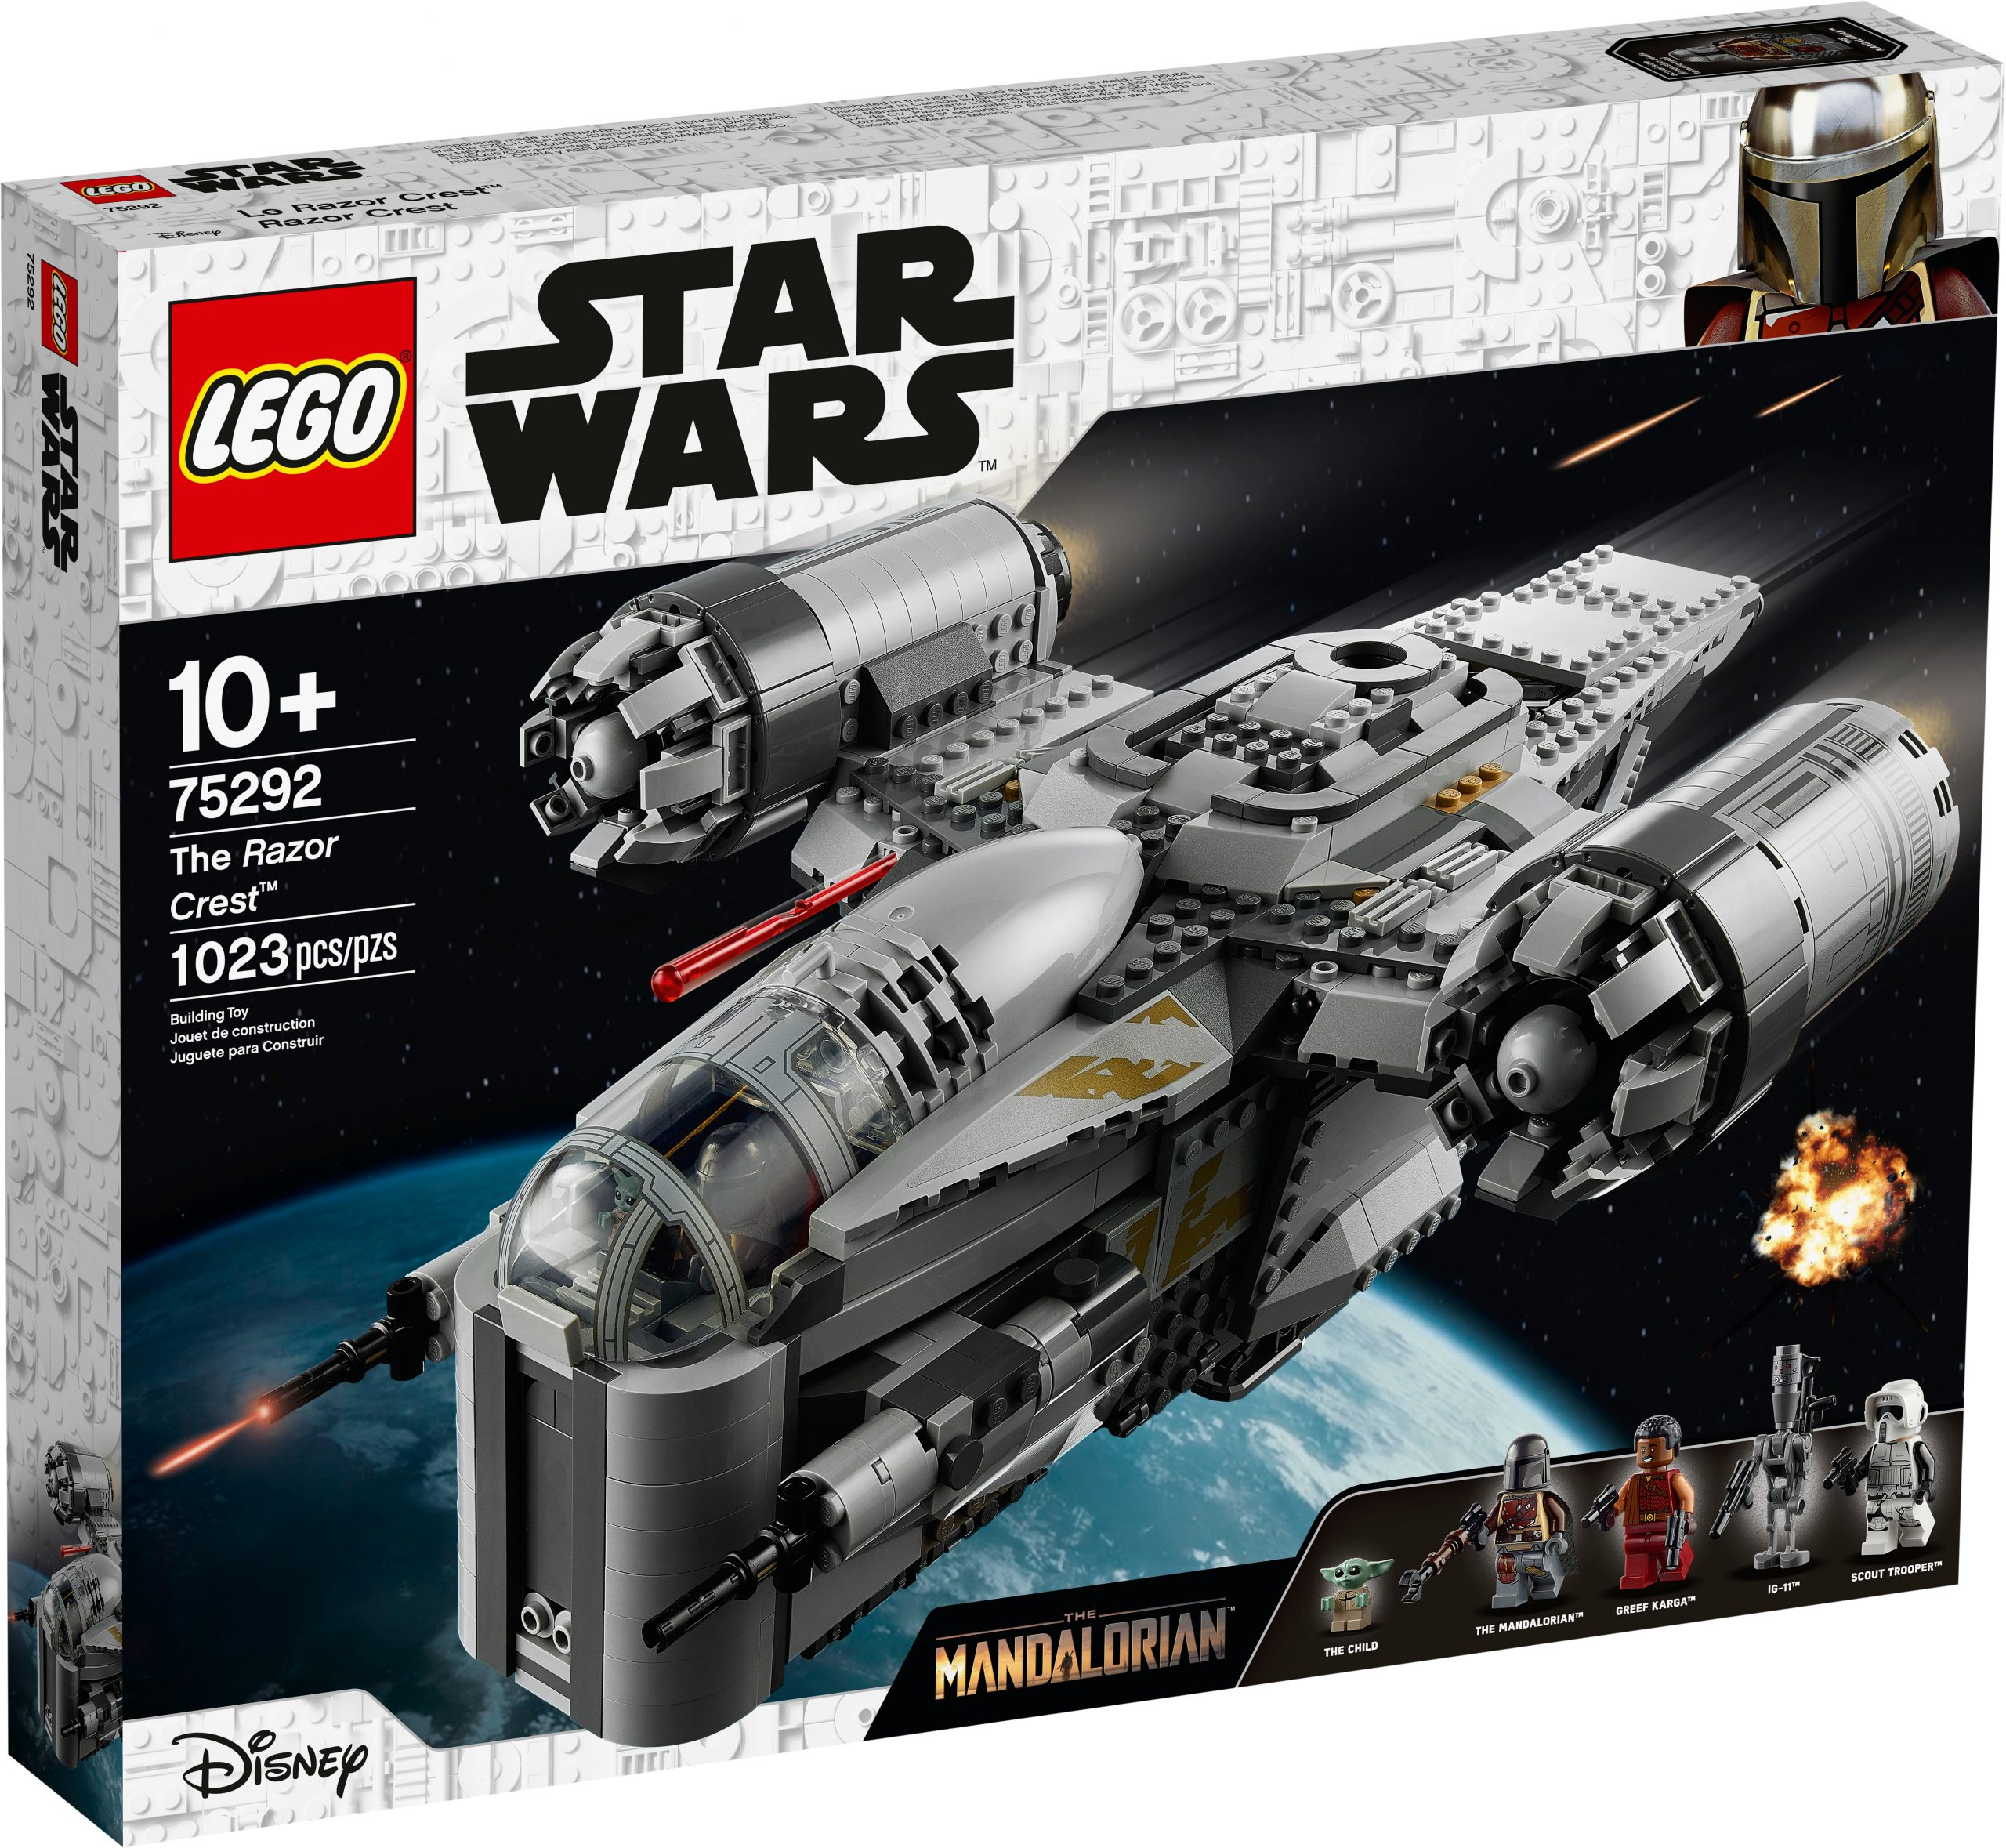 lego-star-wars-mandalorian-razor-crest-75292-box-front-2020 zusammengebaut.com